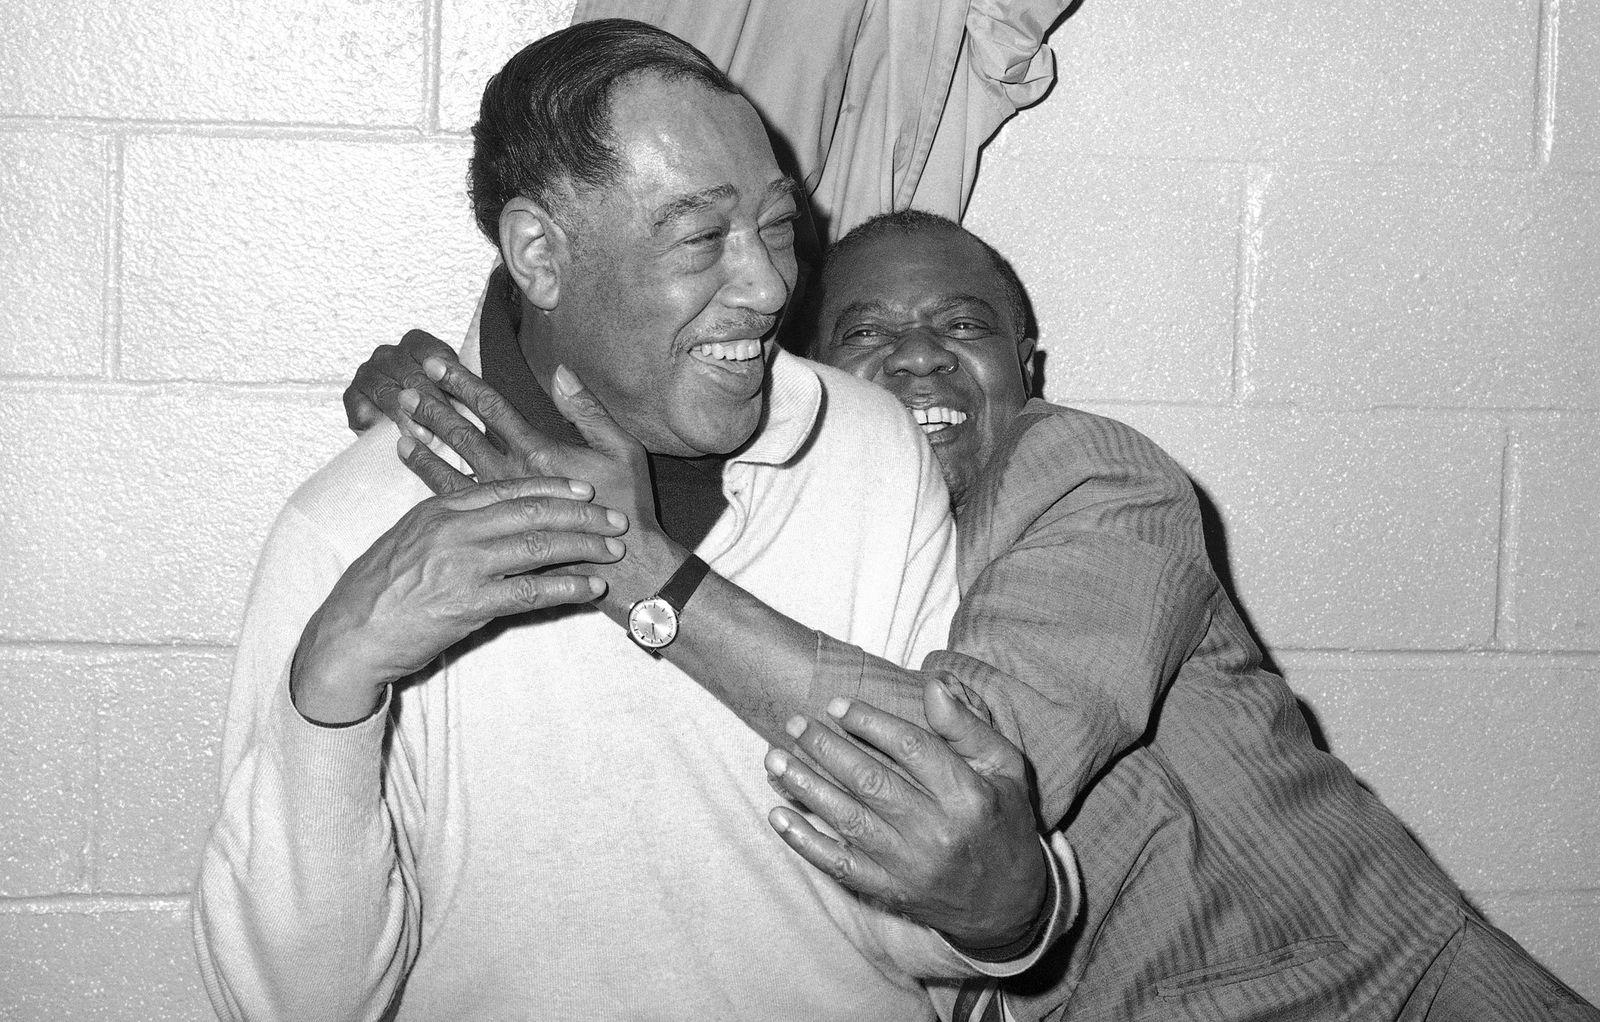 Duke Ellington and Louis Armstrong